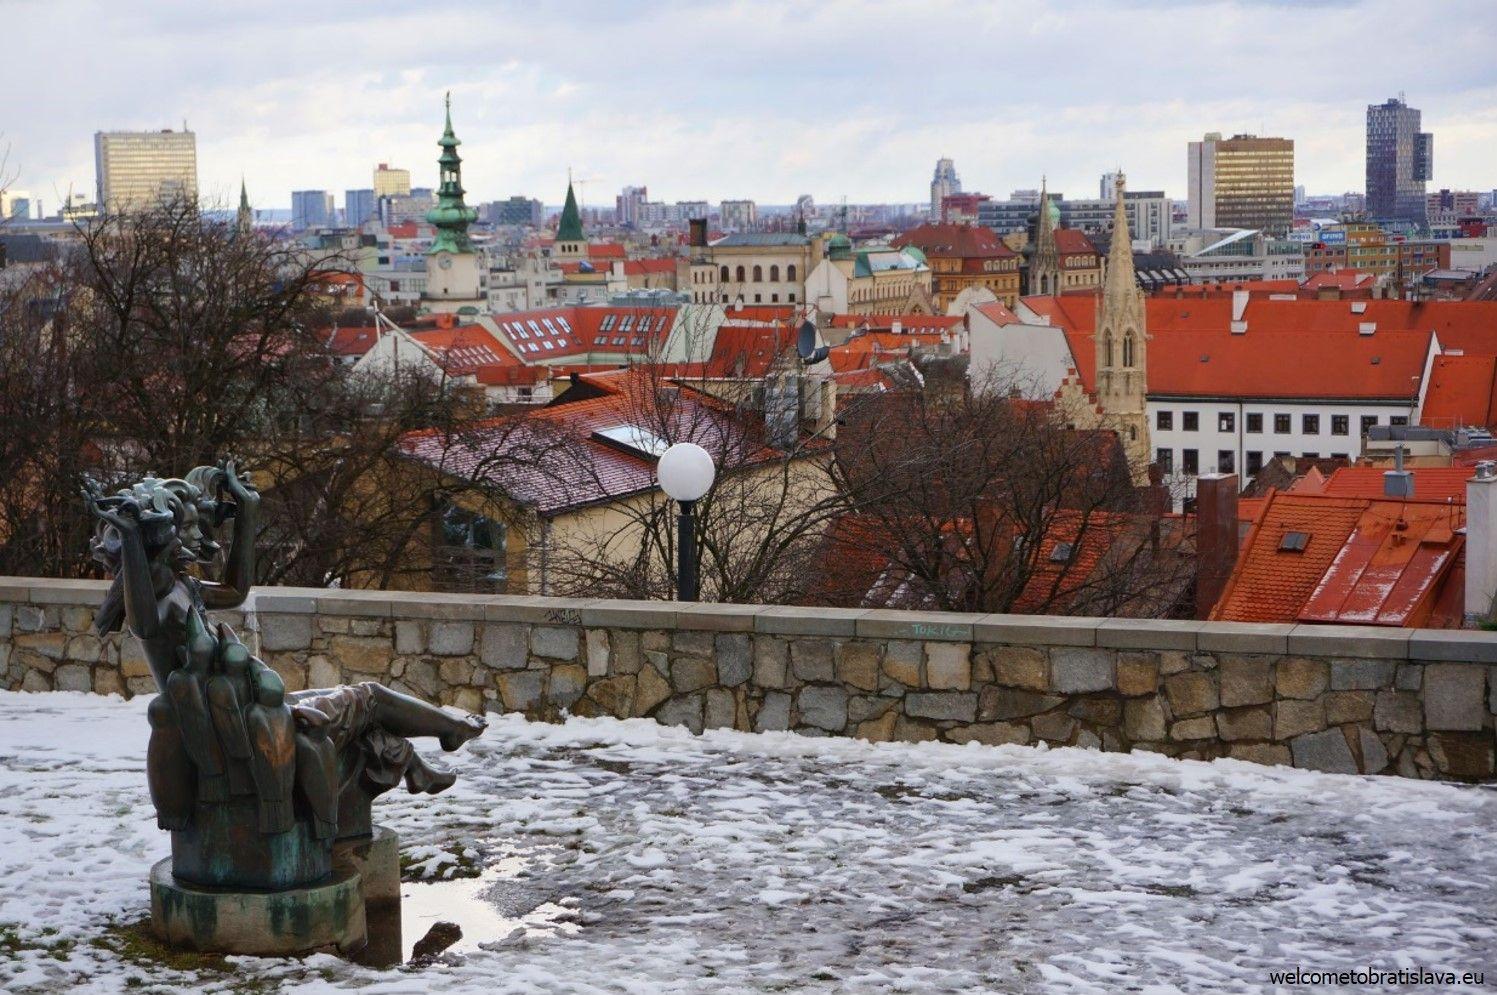 View on the Bratislava city